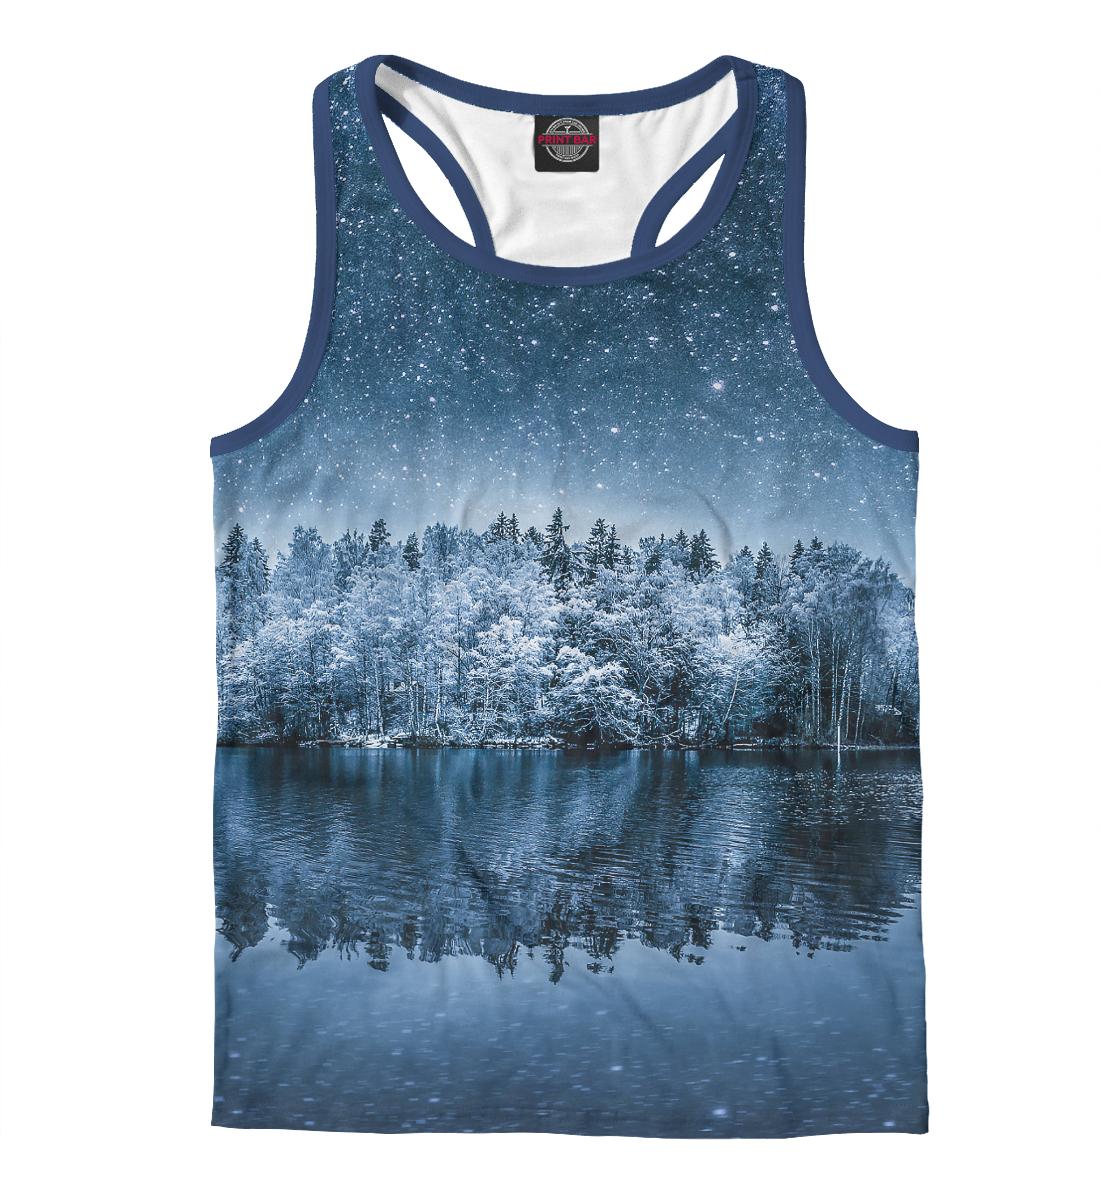 Купить Starry winter, Printbar, Майки борцовки, PEY-915278-mayb-2